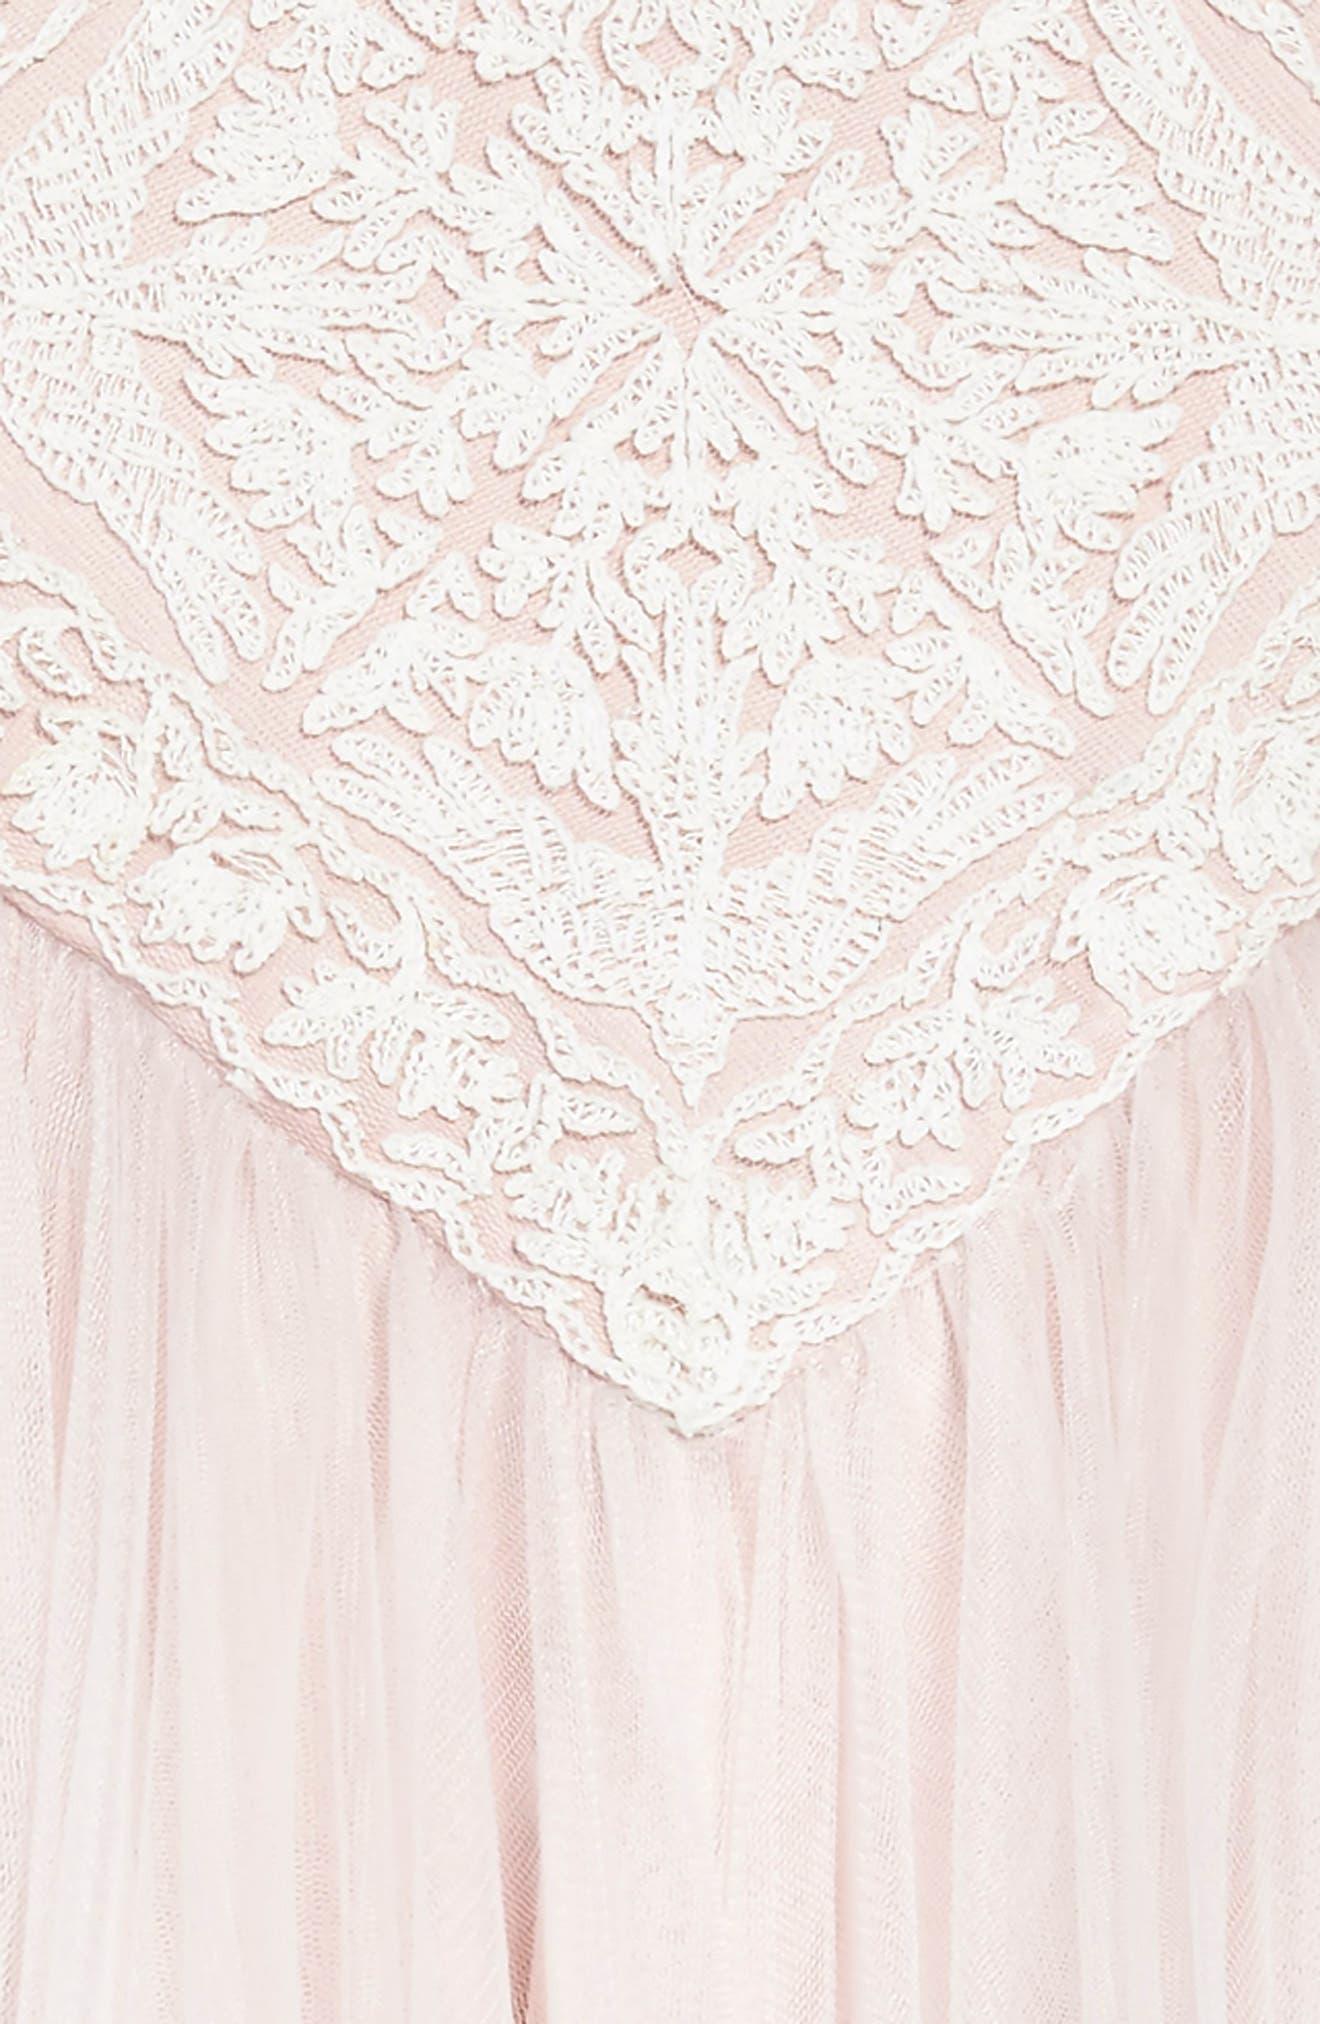 Lace Tulle Dress,                             Alternate thumbnail 3, color,                             Ivory/ Primrose